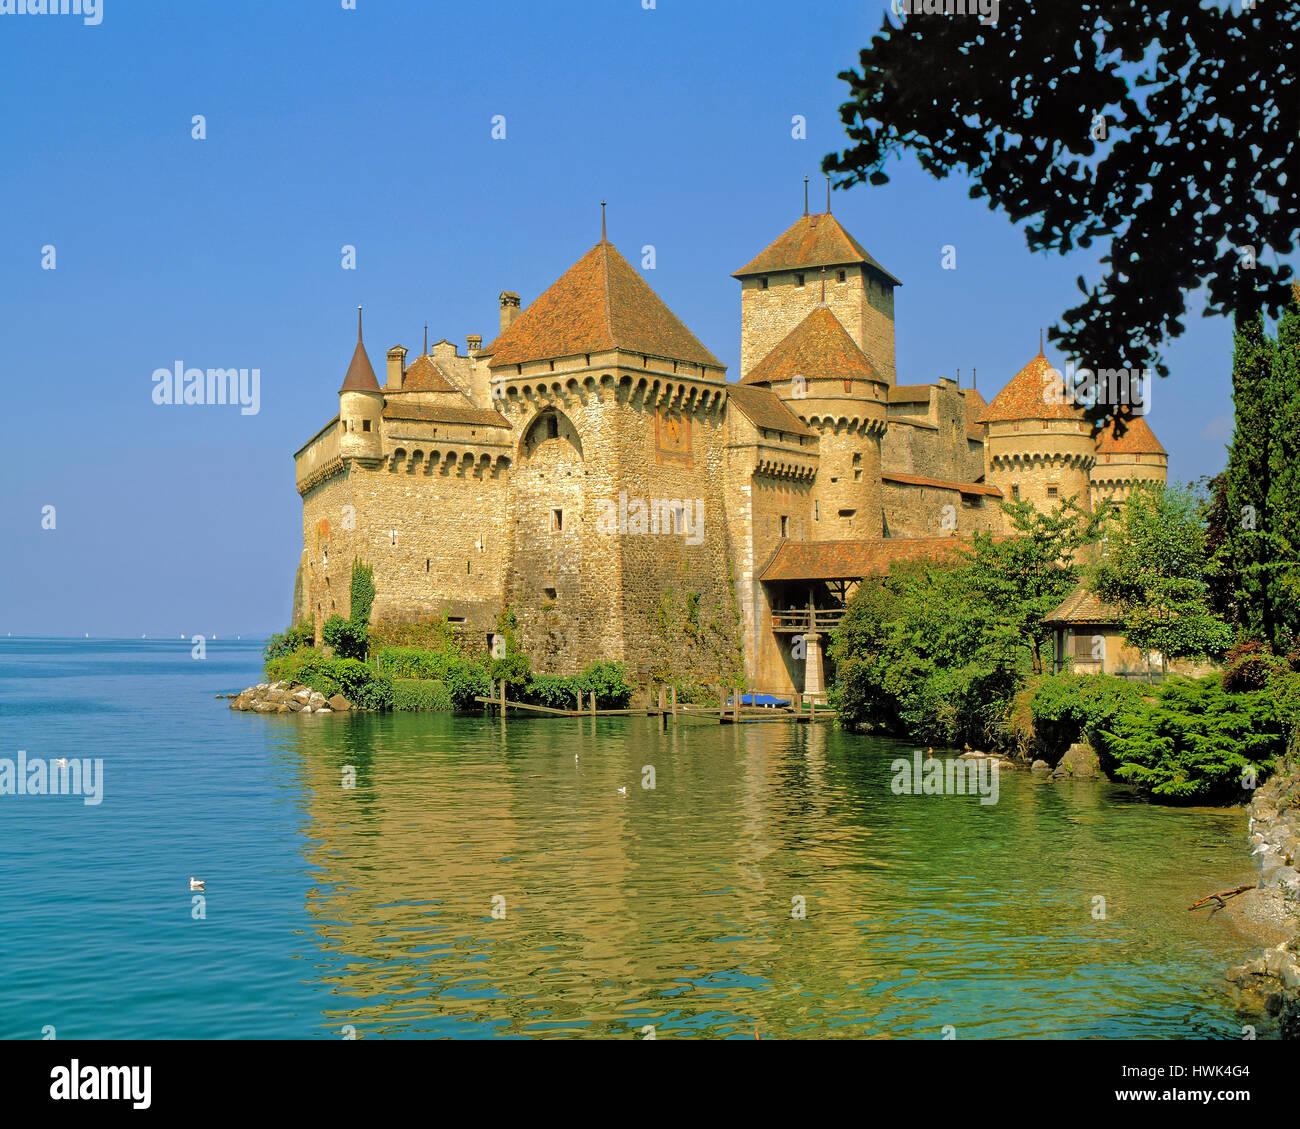 Chateau Chillon on the banks of Lake Leman (Lake Geneva) near Montreux, Switzerland. - Stock Image